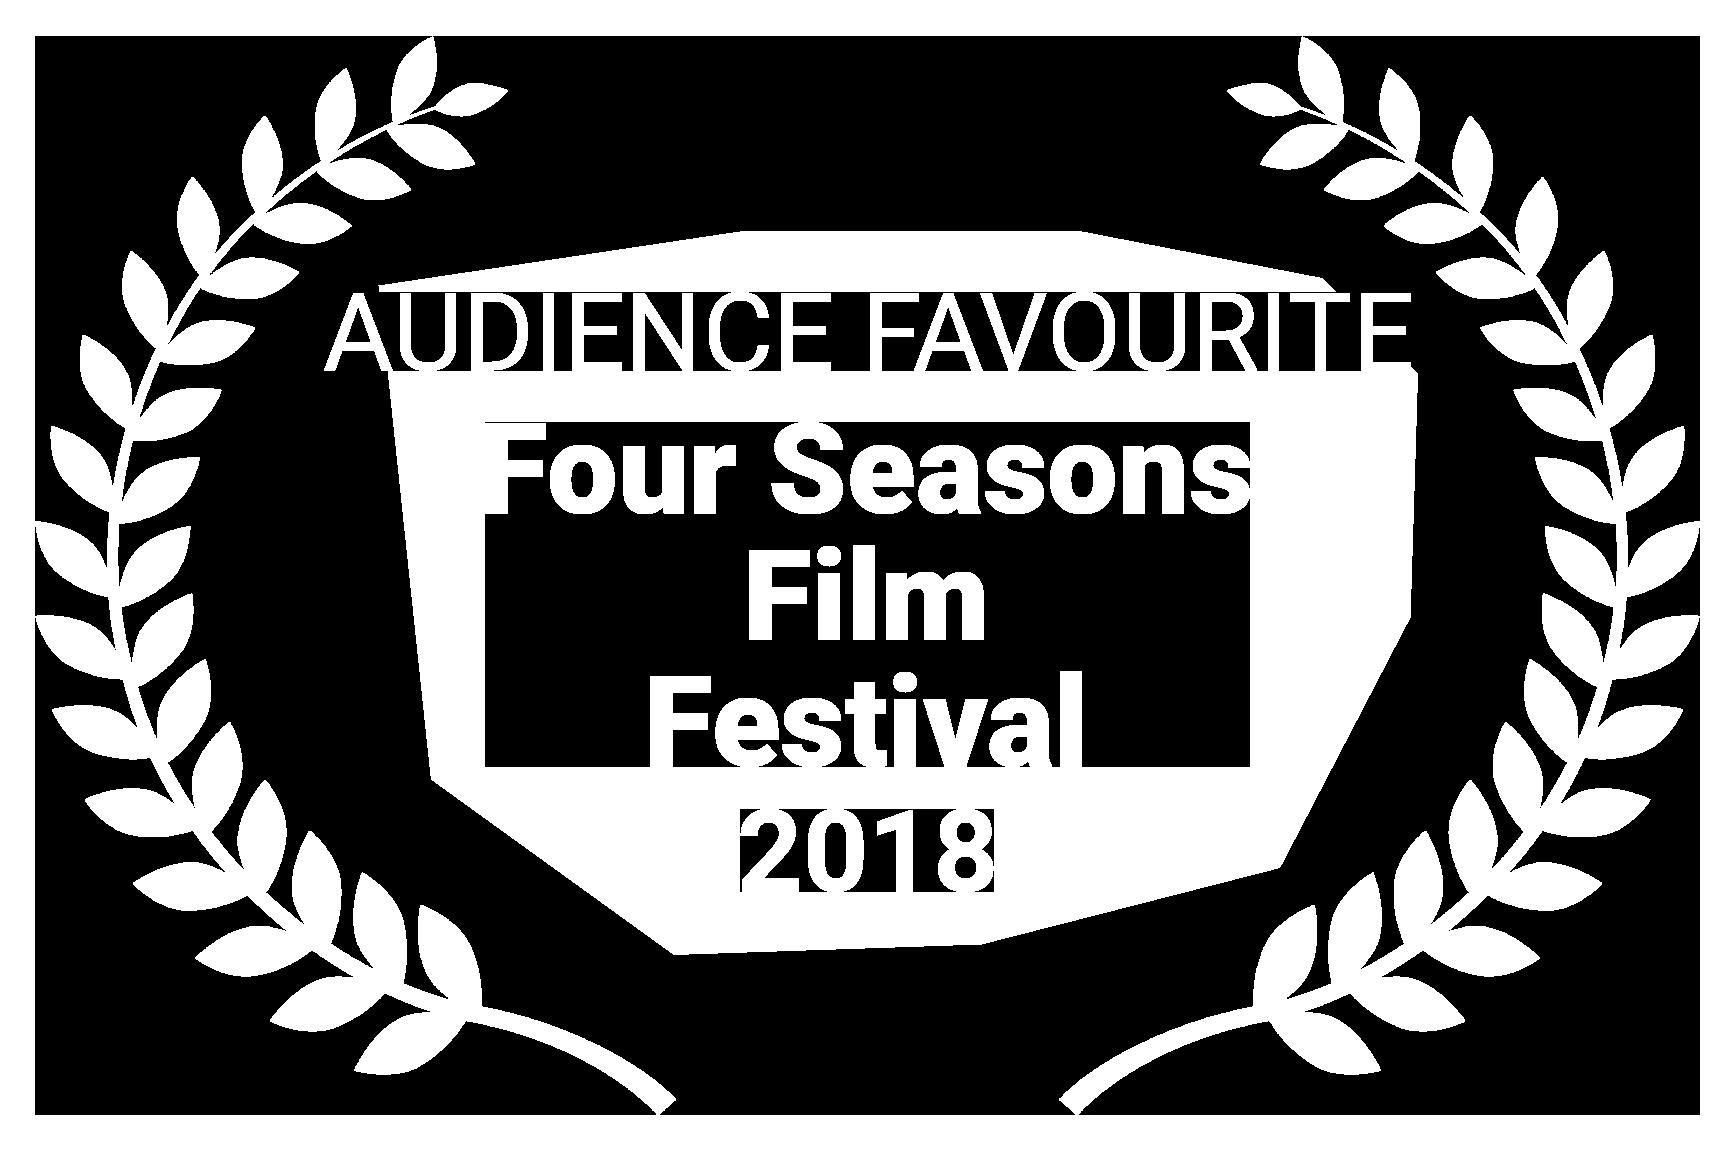 Audience Favourite - Four Seasons Film Festival 2018